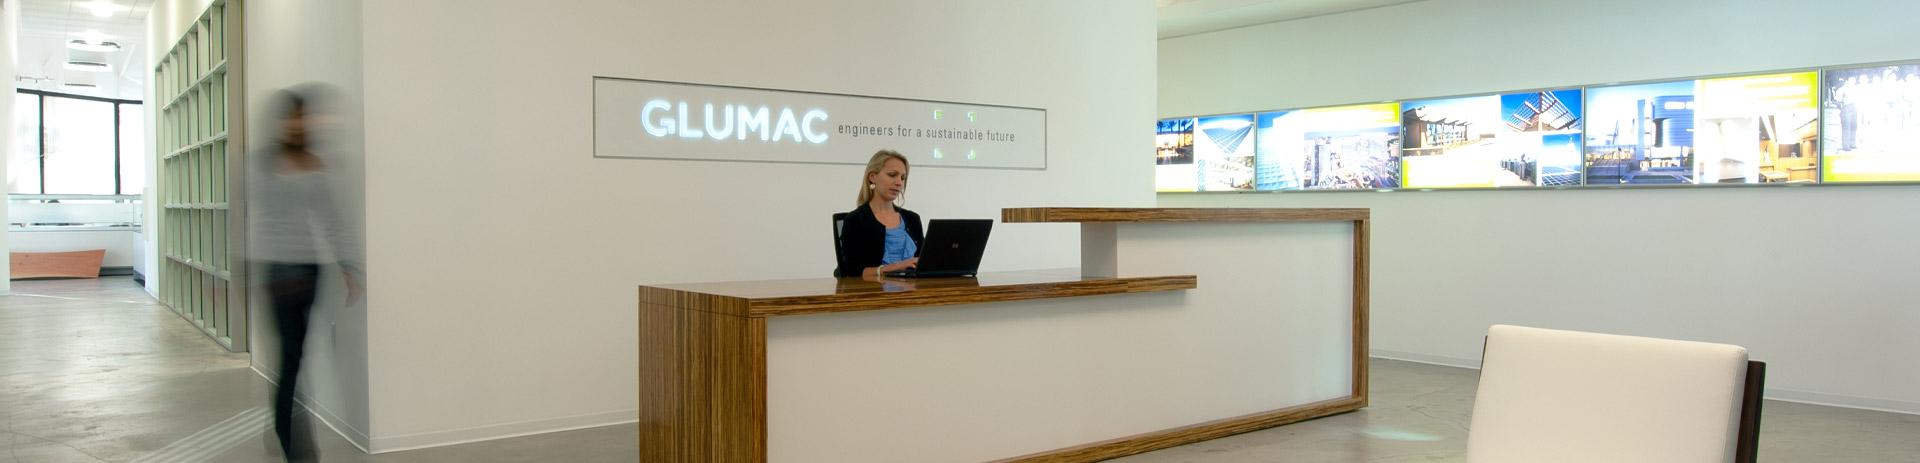 Glumac MEP Engineering Irvine, California Office